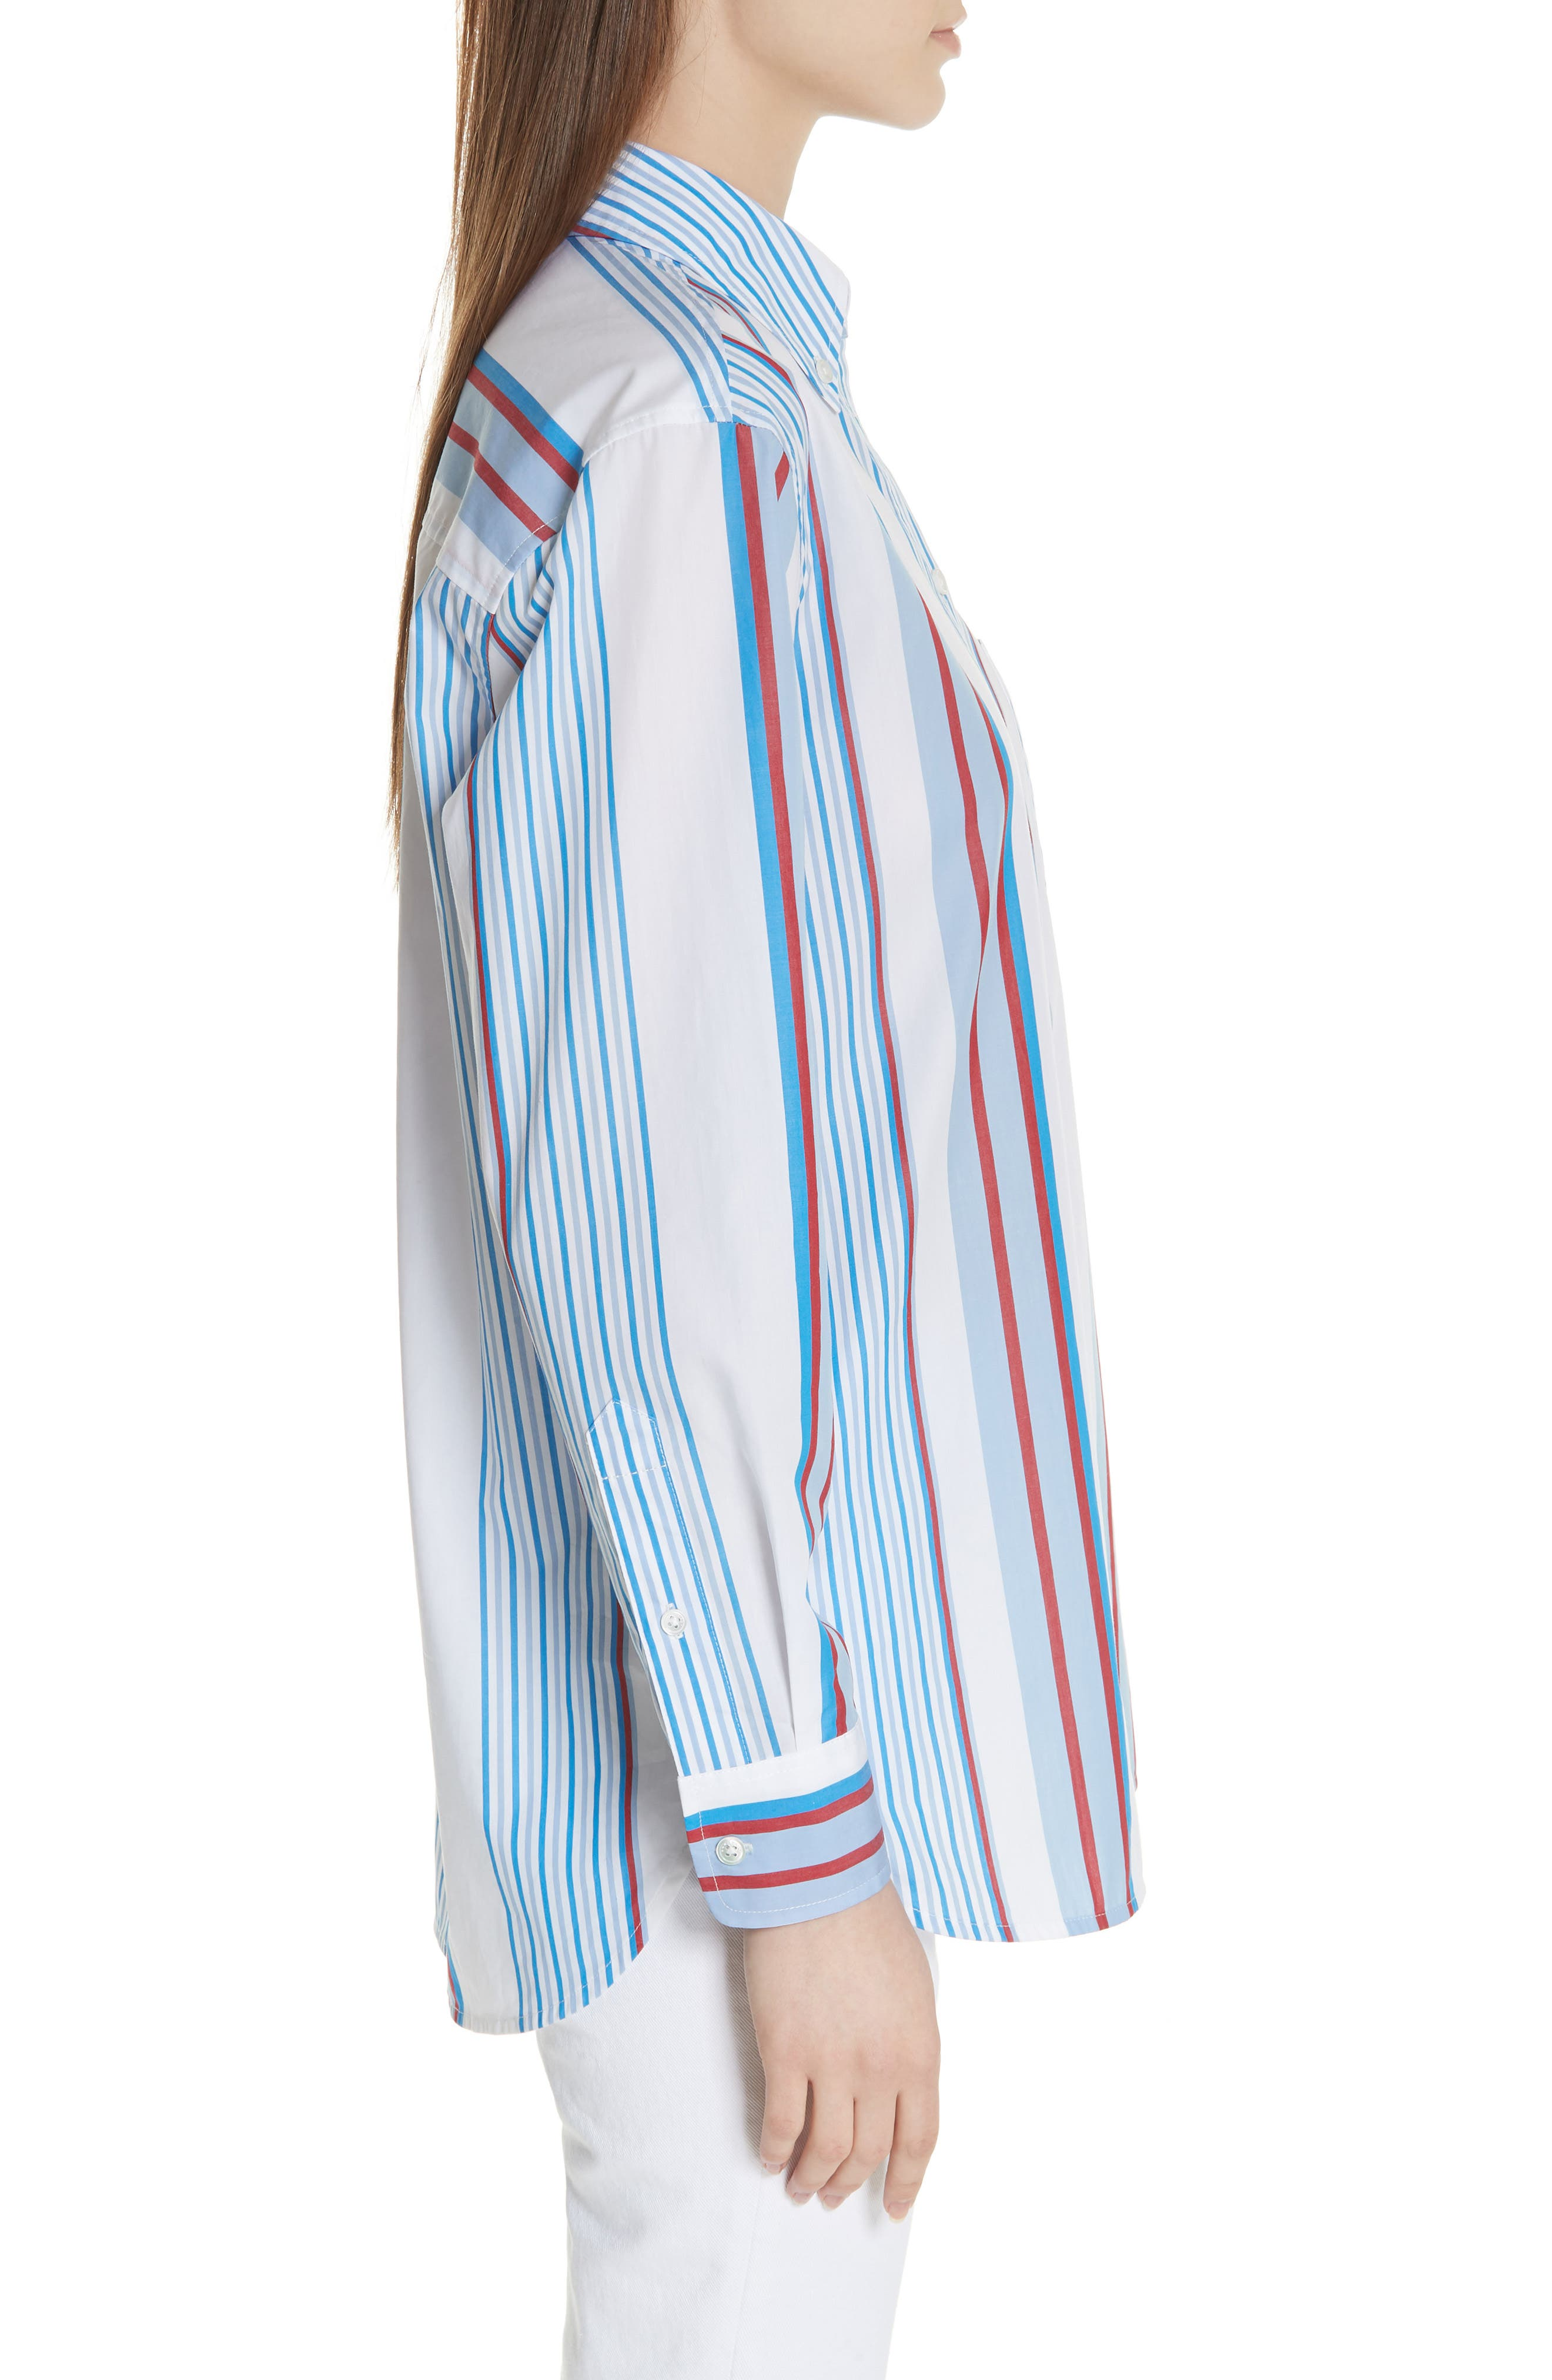 Margaux Stripe Shirt,                             Alternate thumbnail 3, color,                             BLUE WHITE MULTI